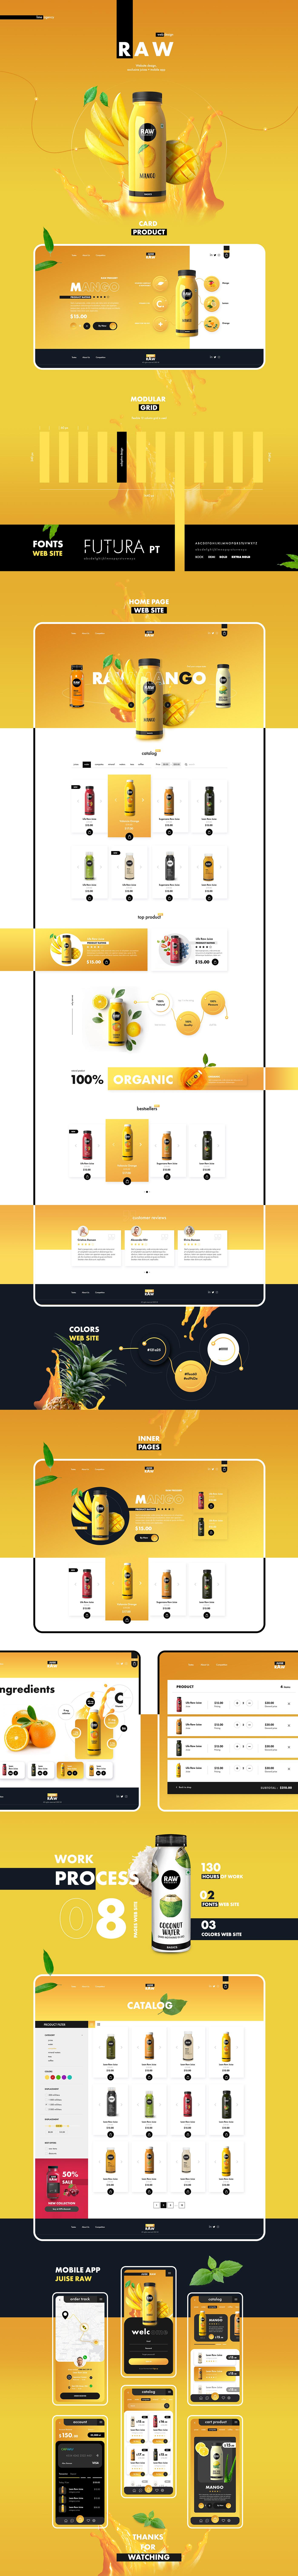 brand Website app Responsive Web Design  UI/UX graphic design  application design user interface